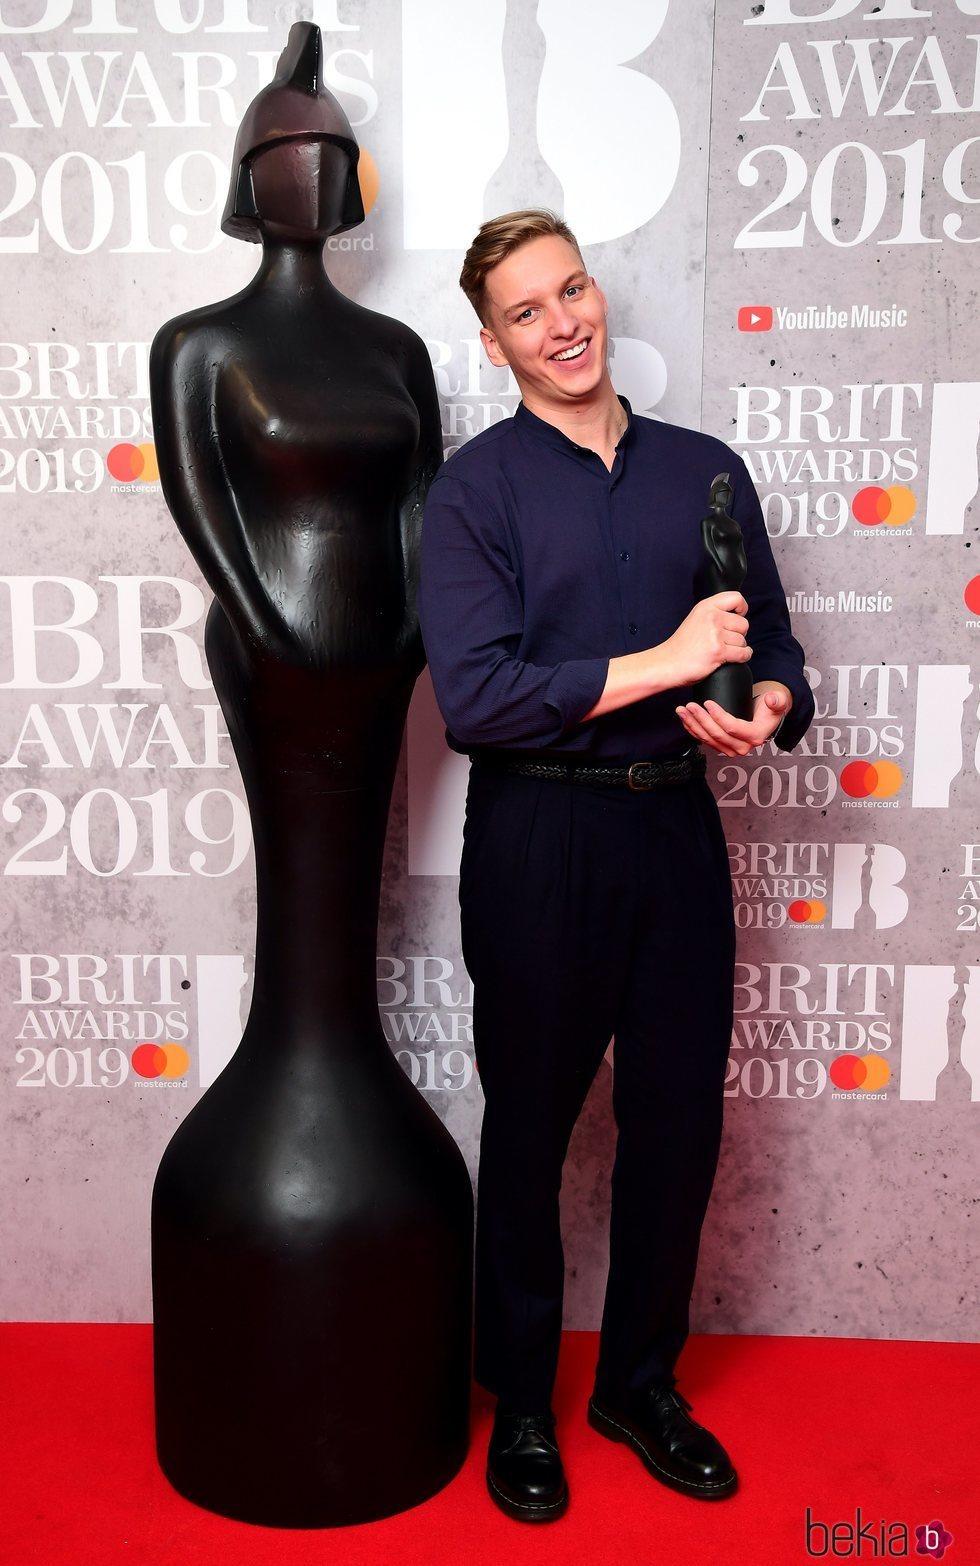 George Ezra con su premio Brit Awards 2019